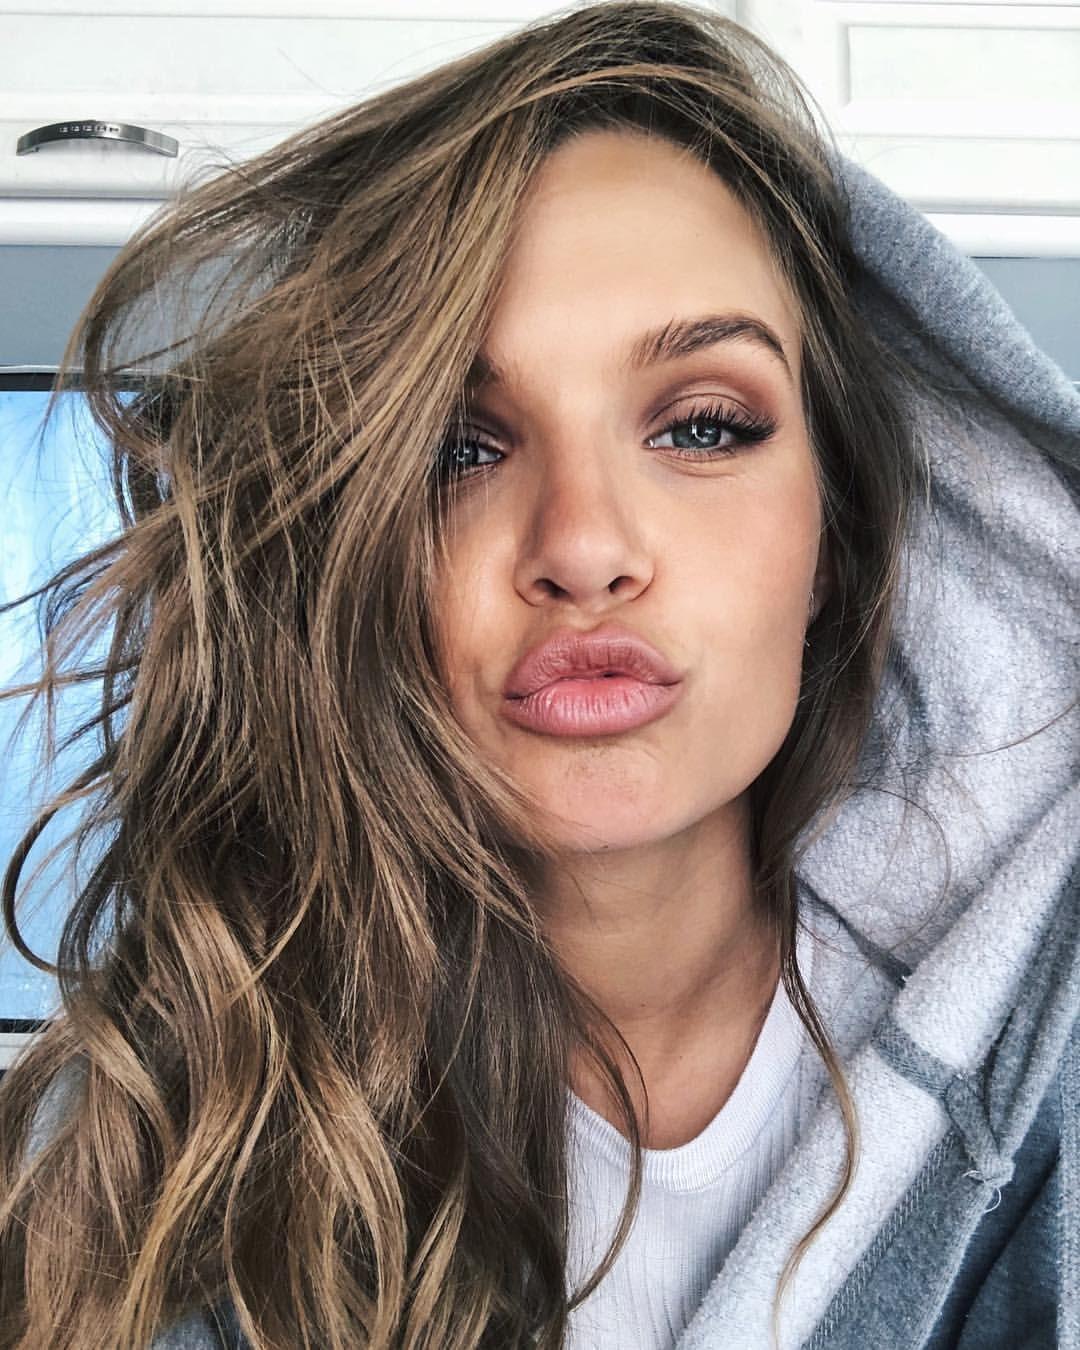 Instagram Josephine Skriver naked (25 images), Paparazzi